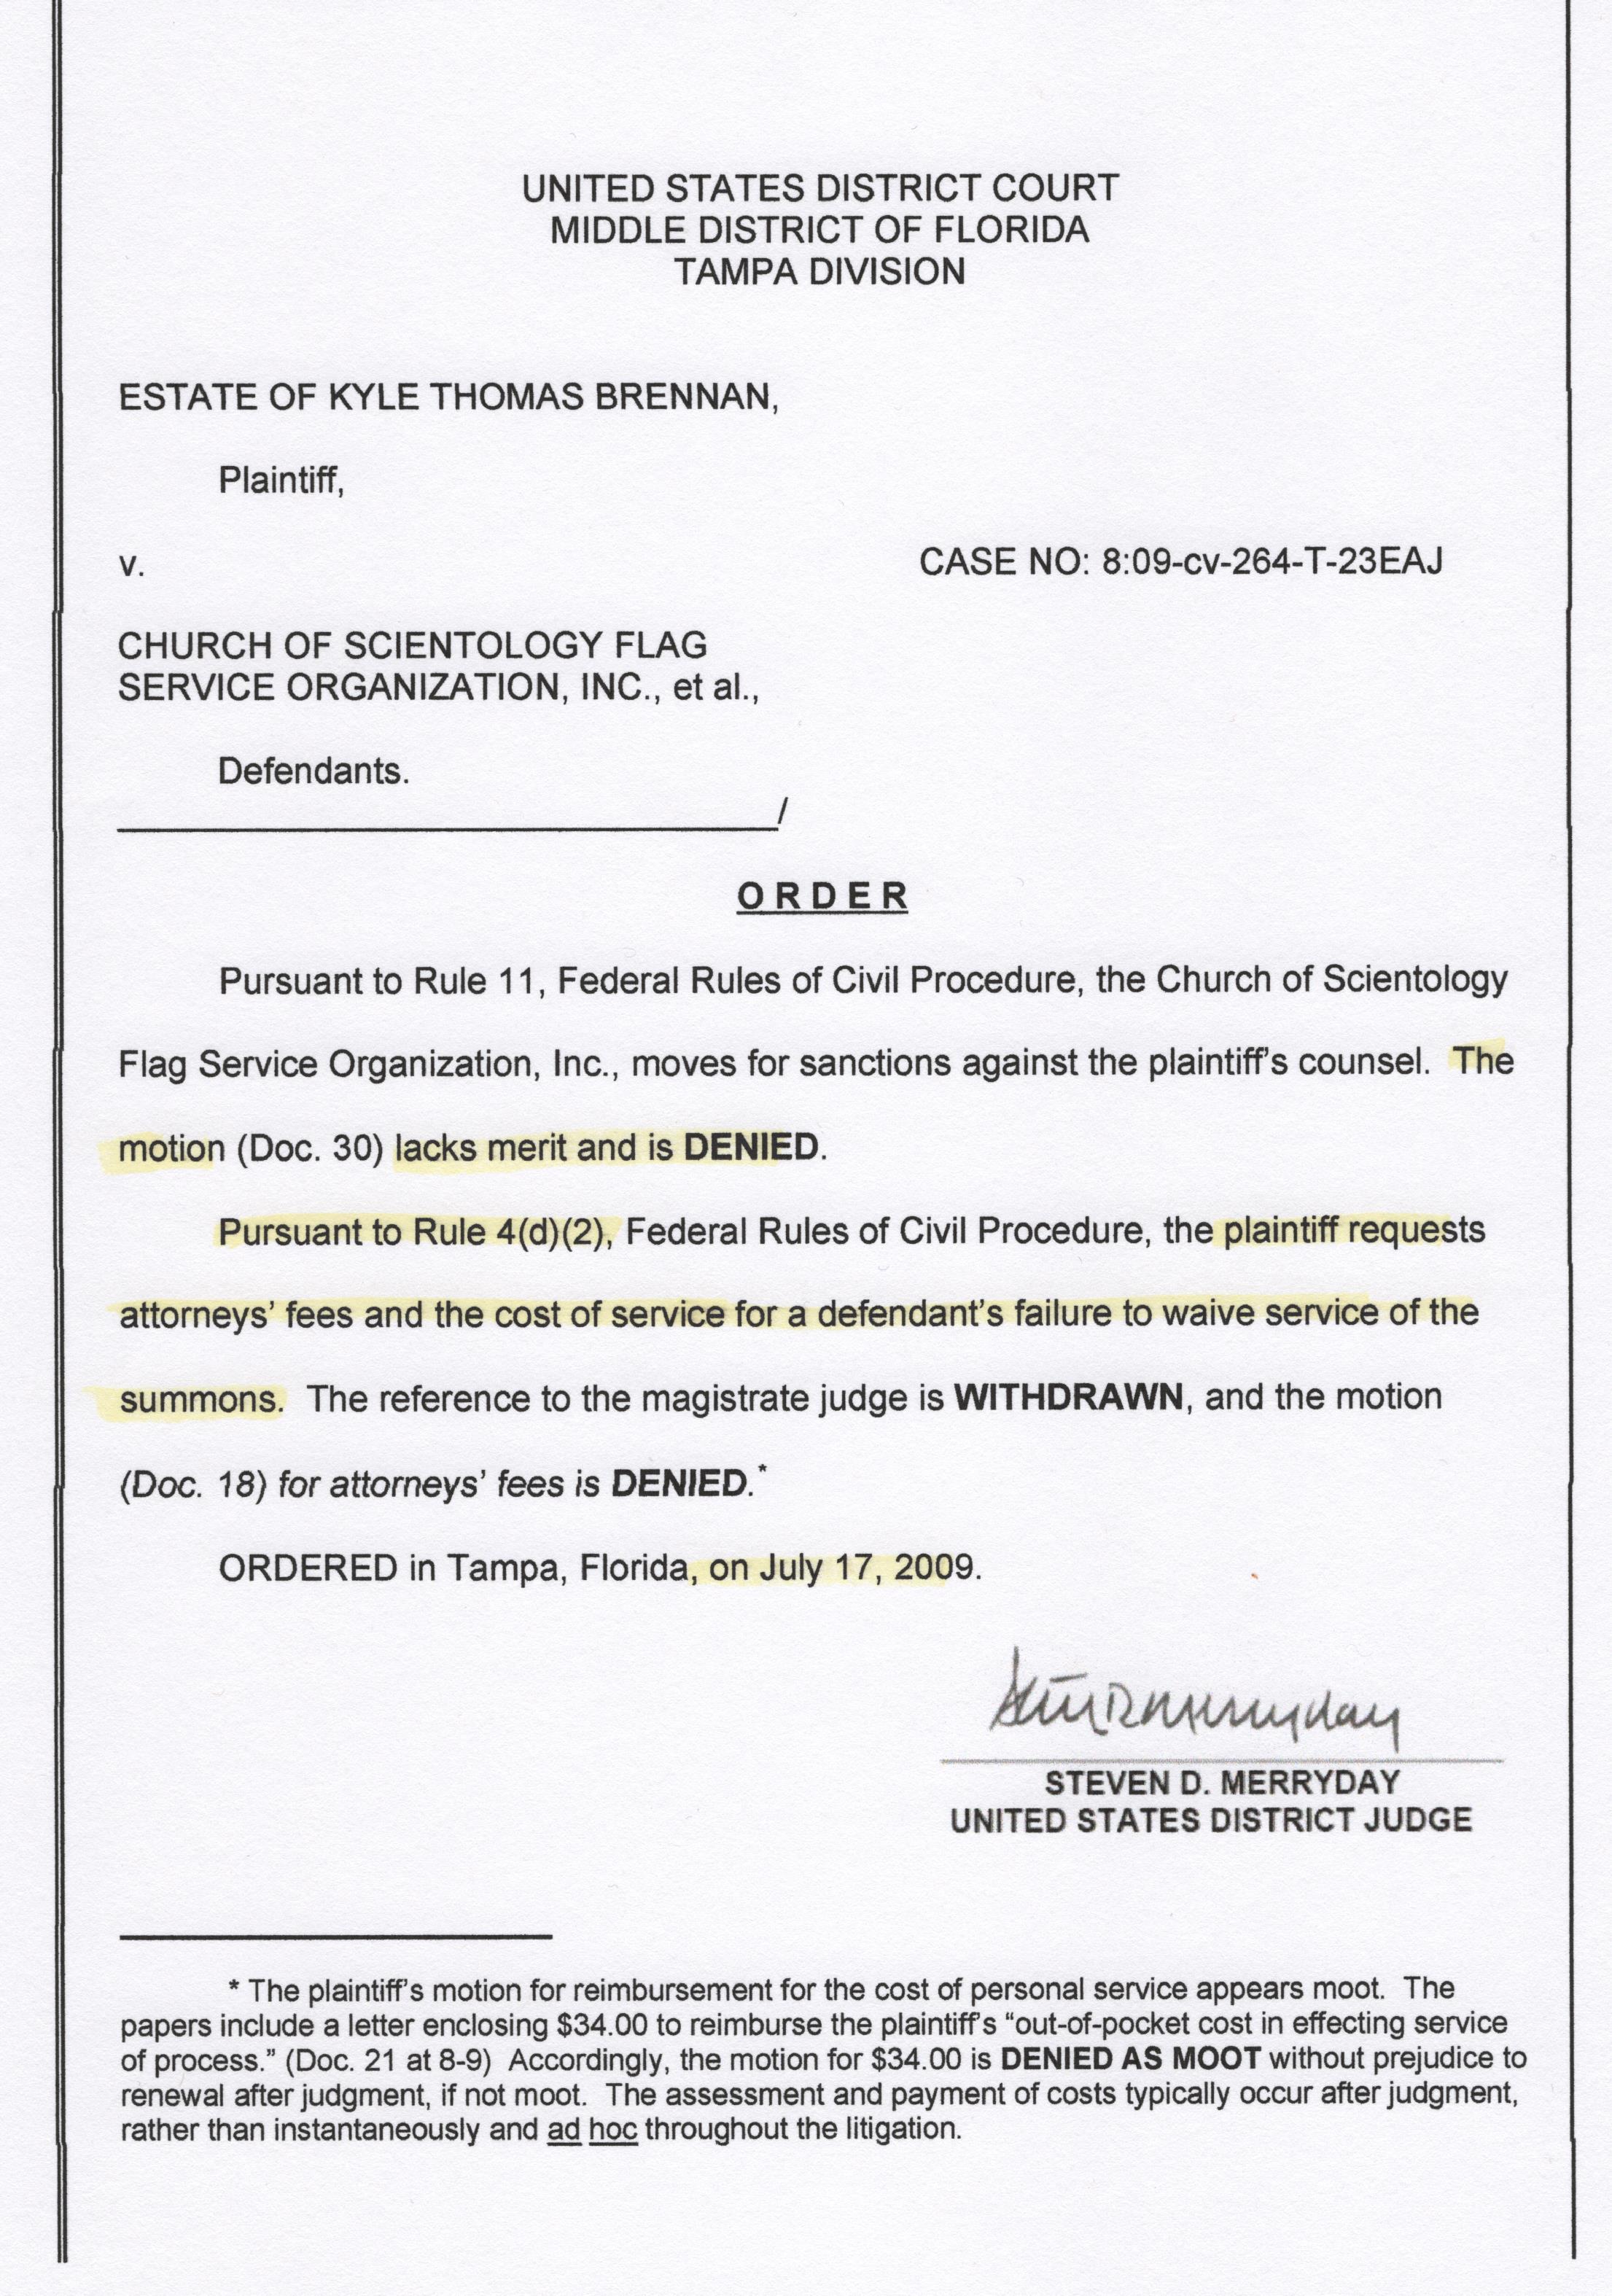 Judge Steven D. Merryday, Sanctions against Brennan 001